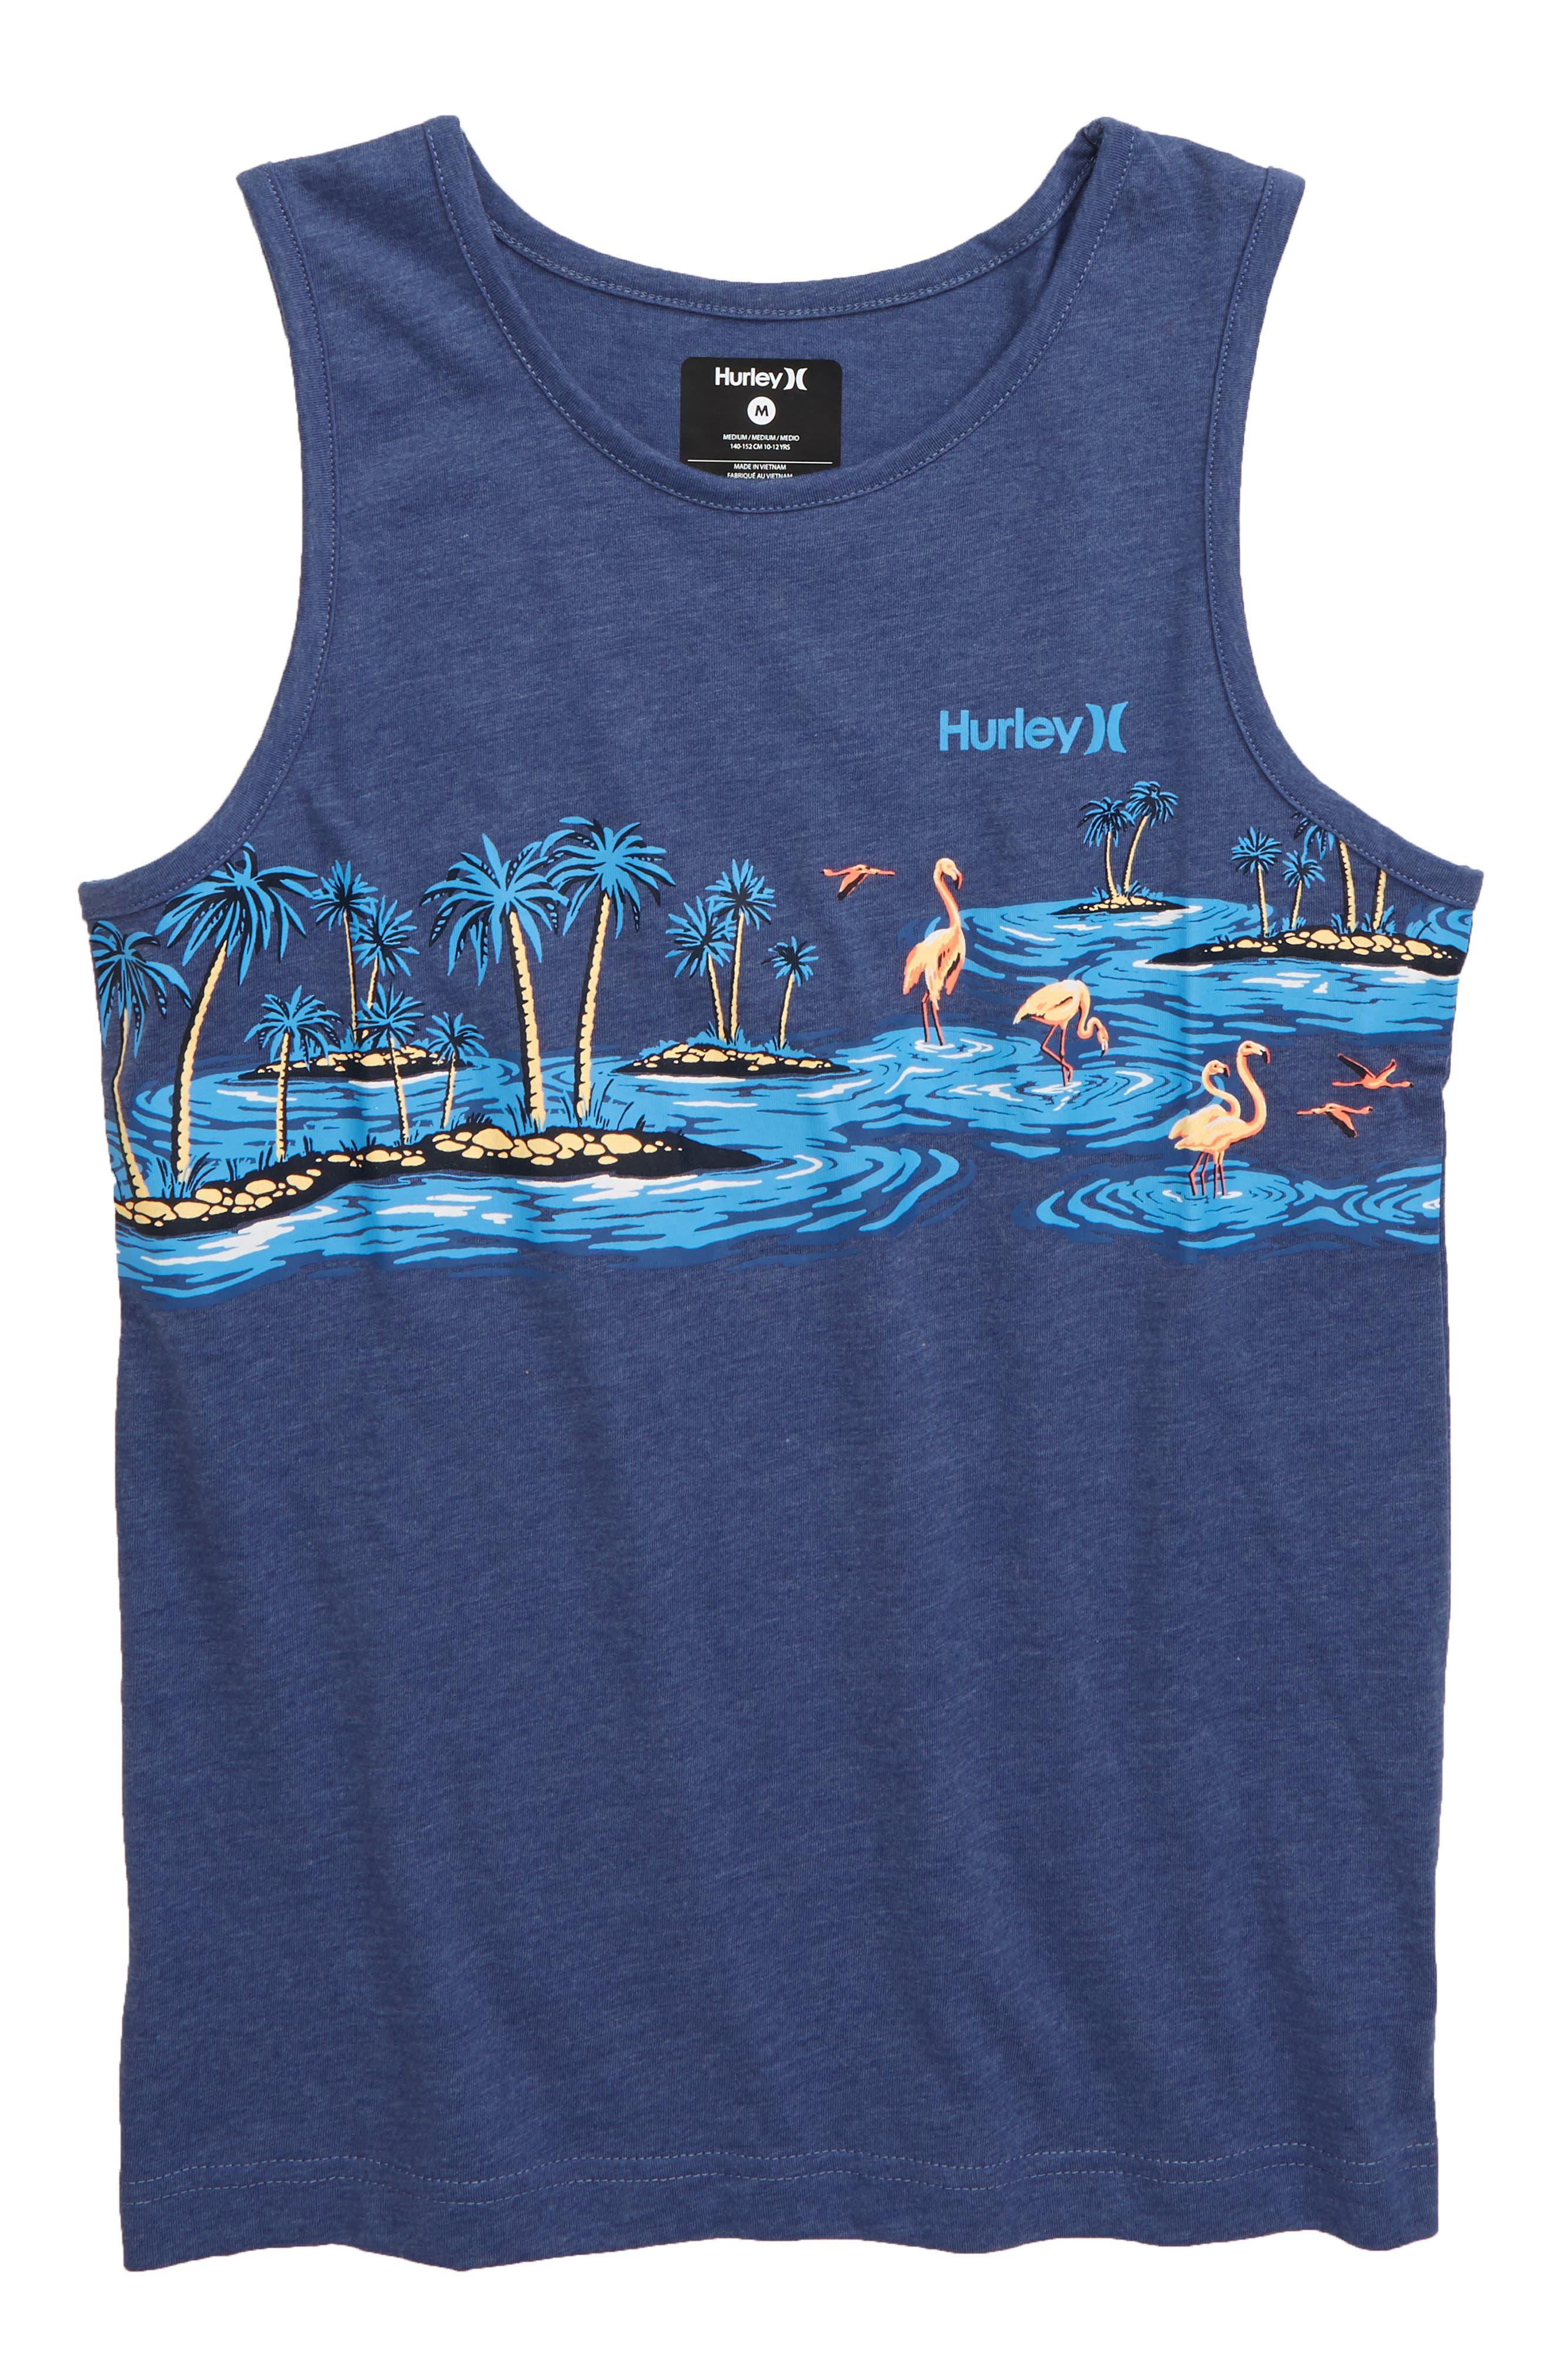 Boys Hurley Flamingo Tank Size XL (1820)  Blue